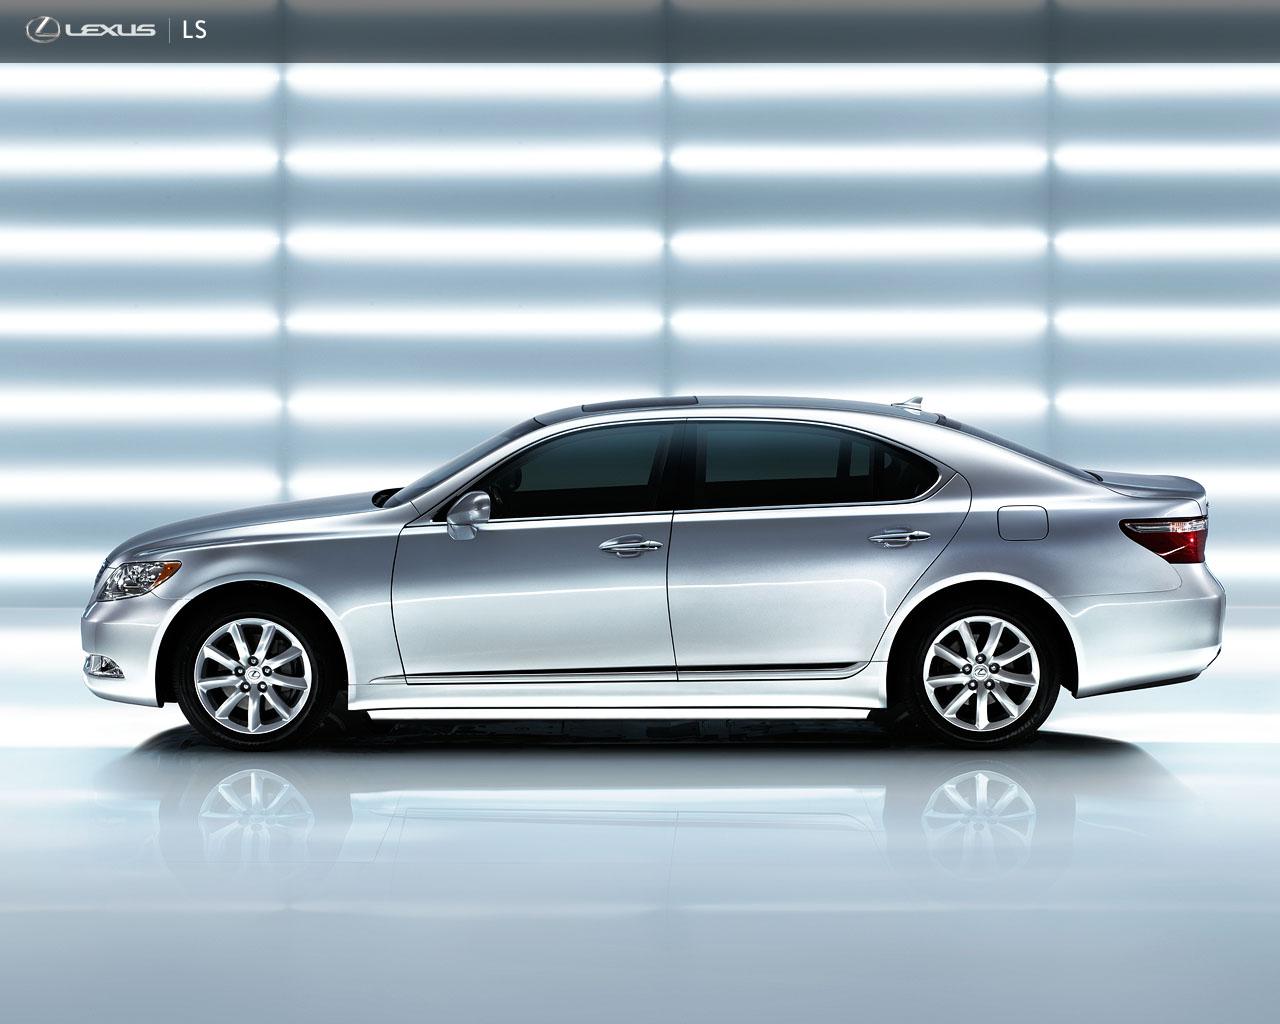 Lexus LS 460 L Luxury Sedan